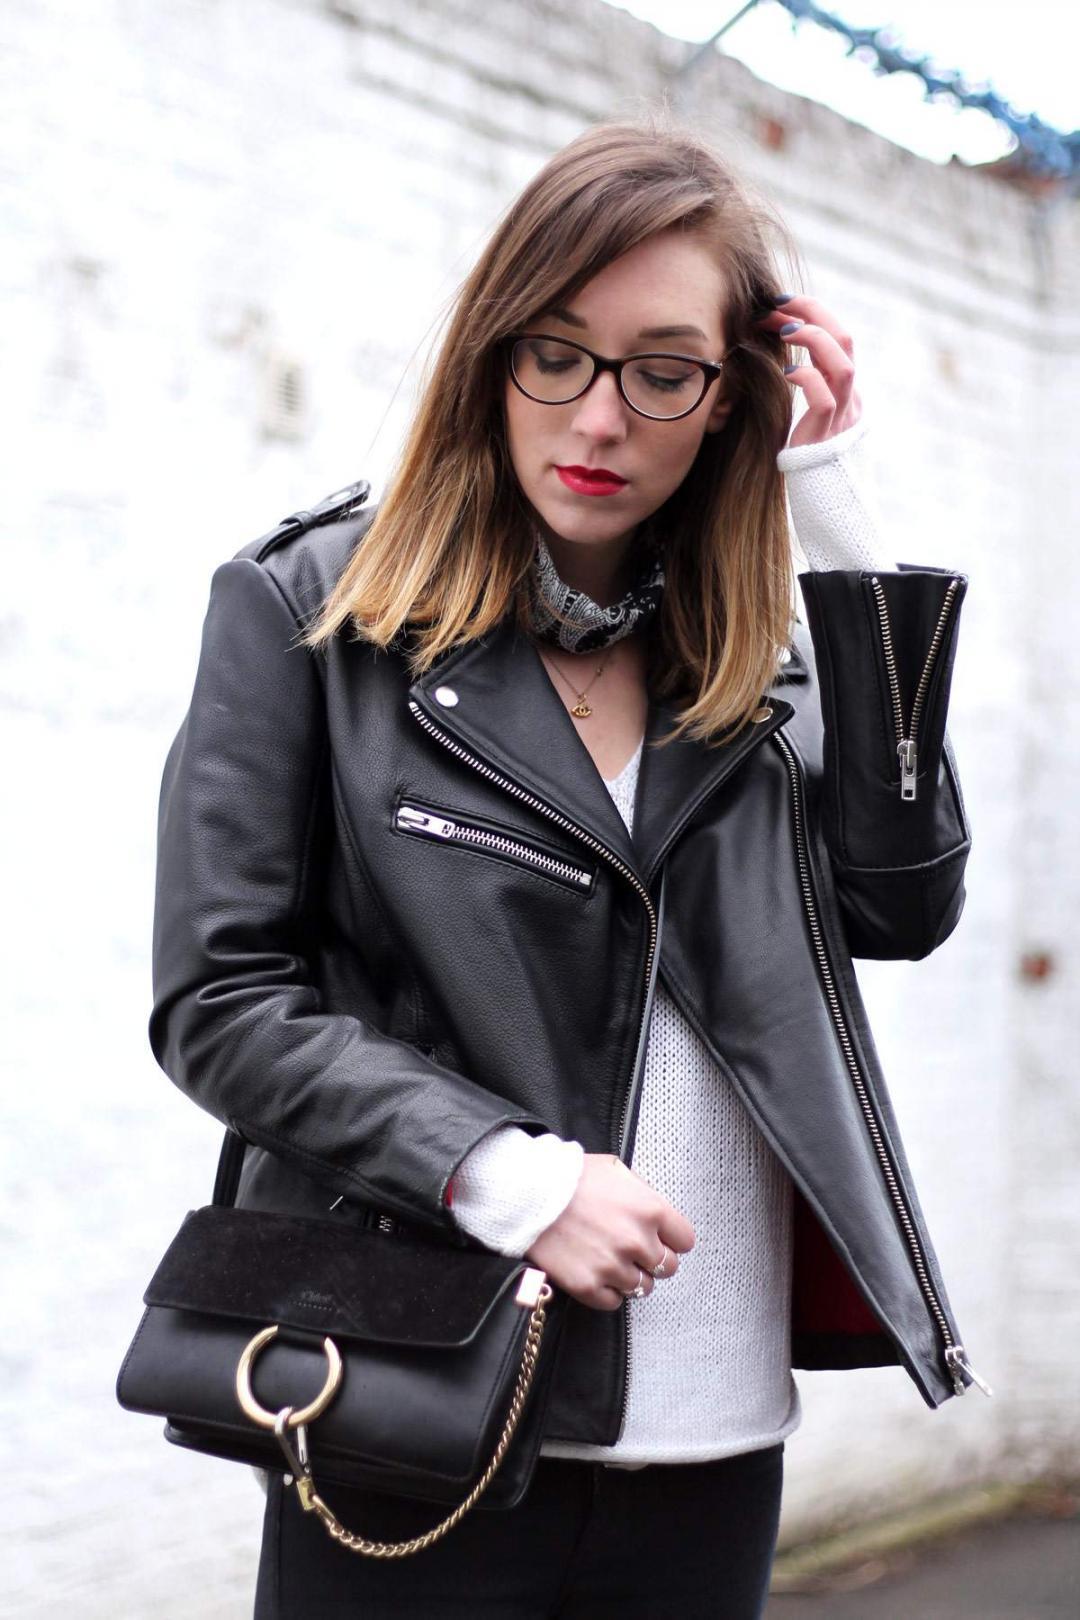 replica chloe handbags uk - Black and White - The Lovecats Inc